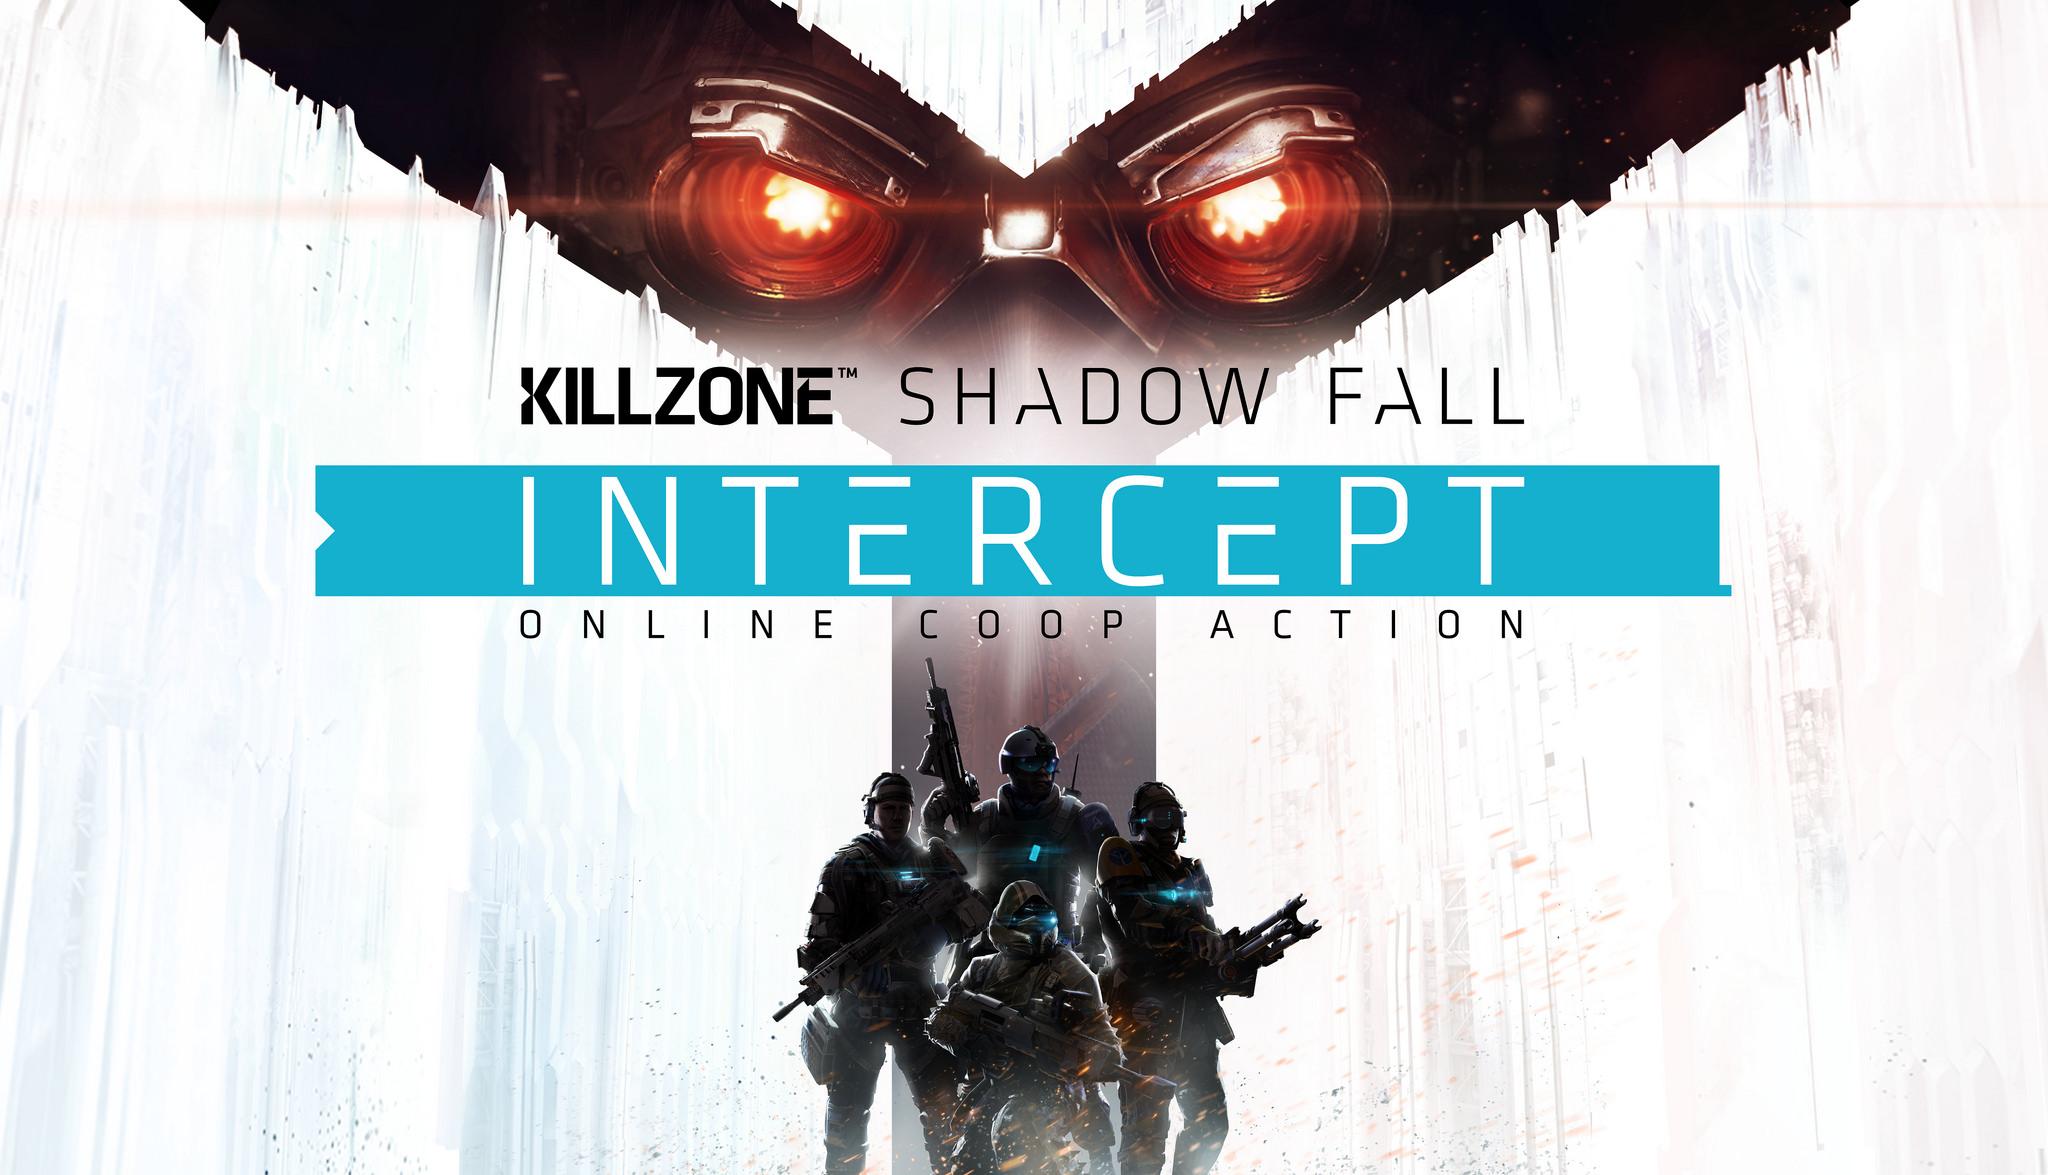 killzone-shadowfall-intercept-tgp1.jpg